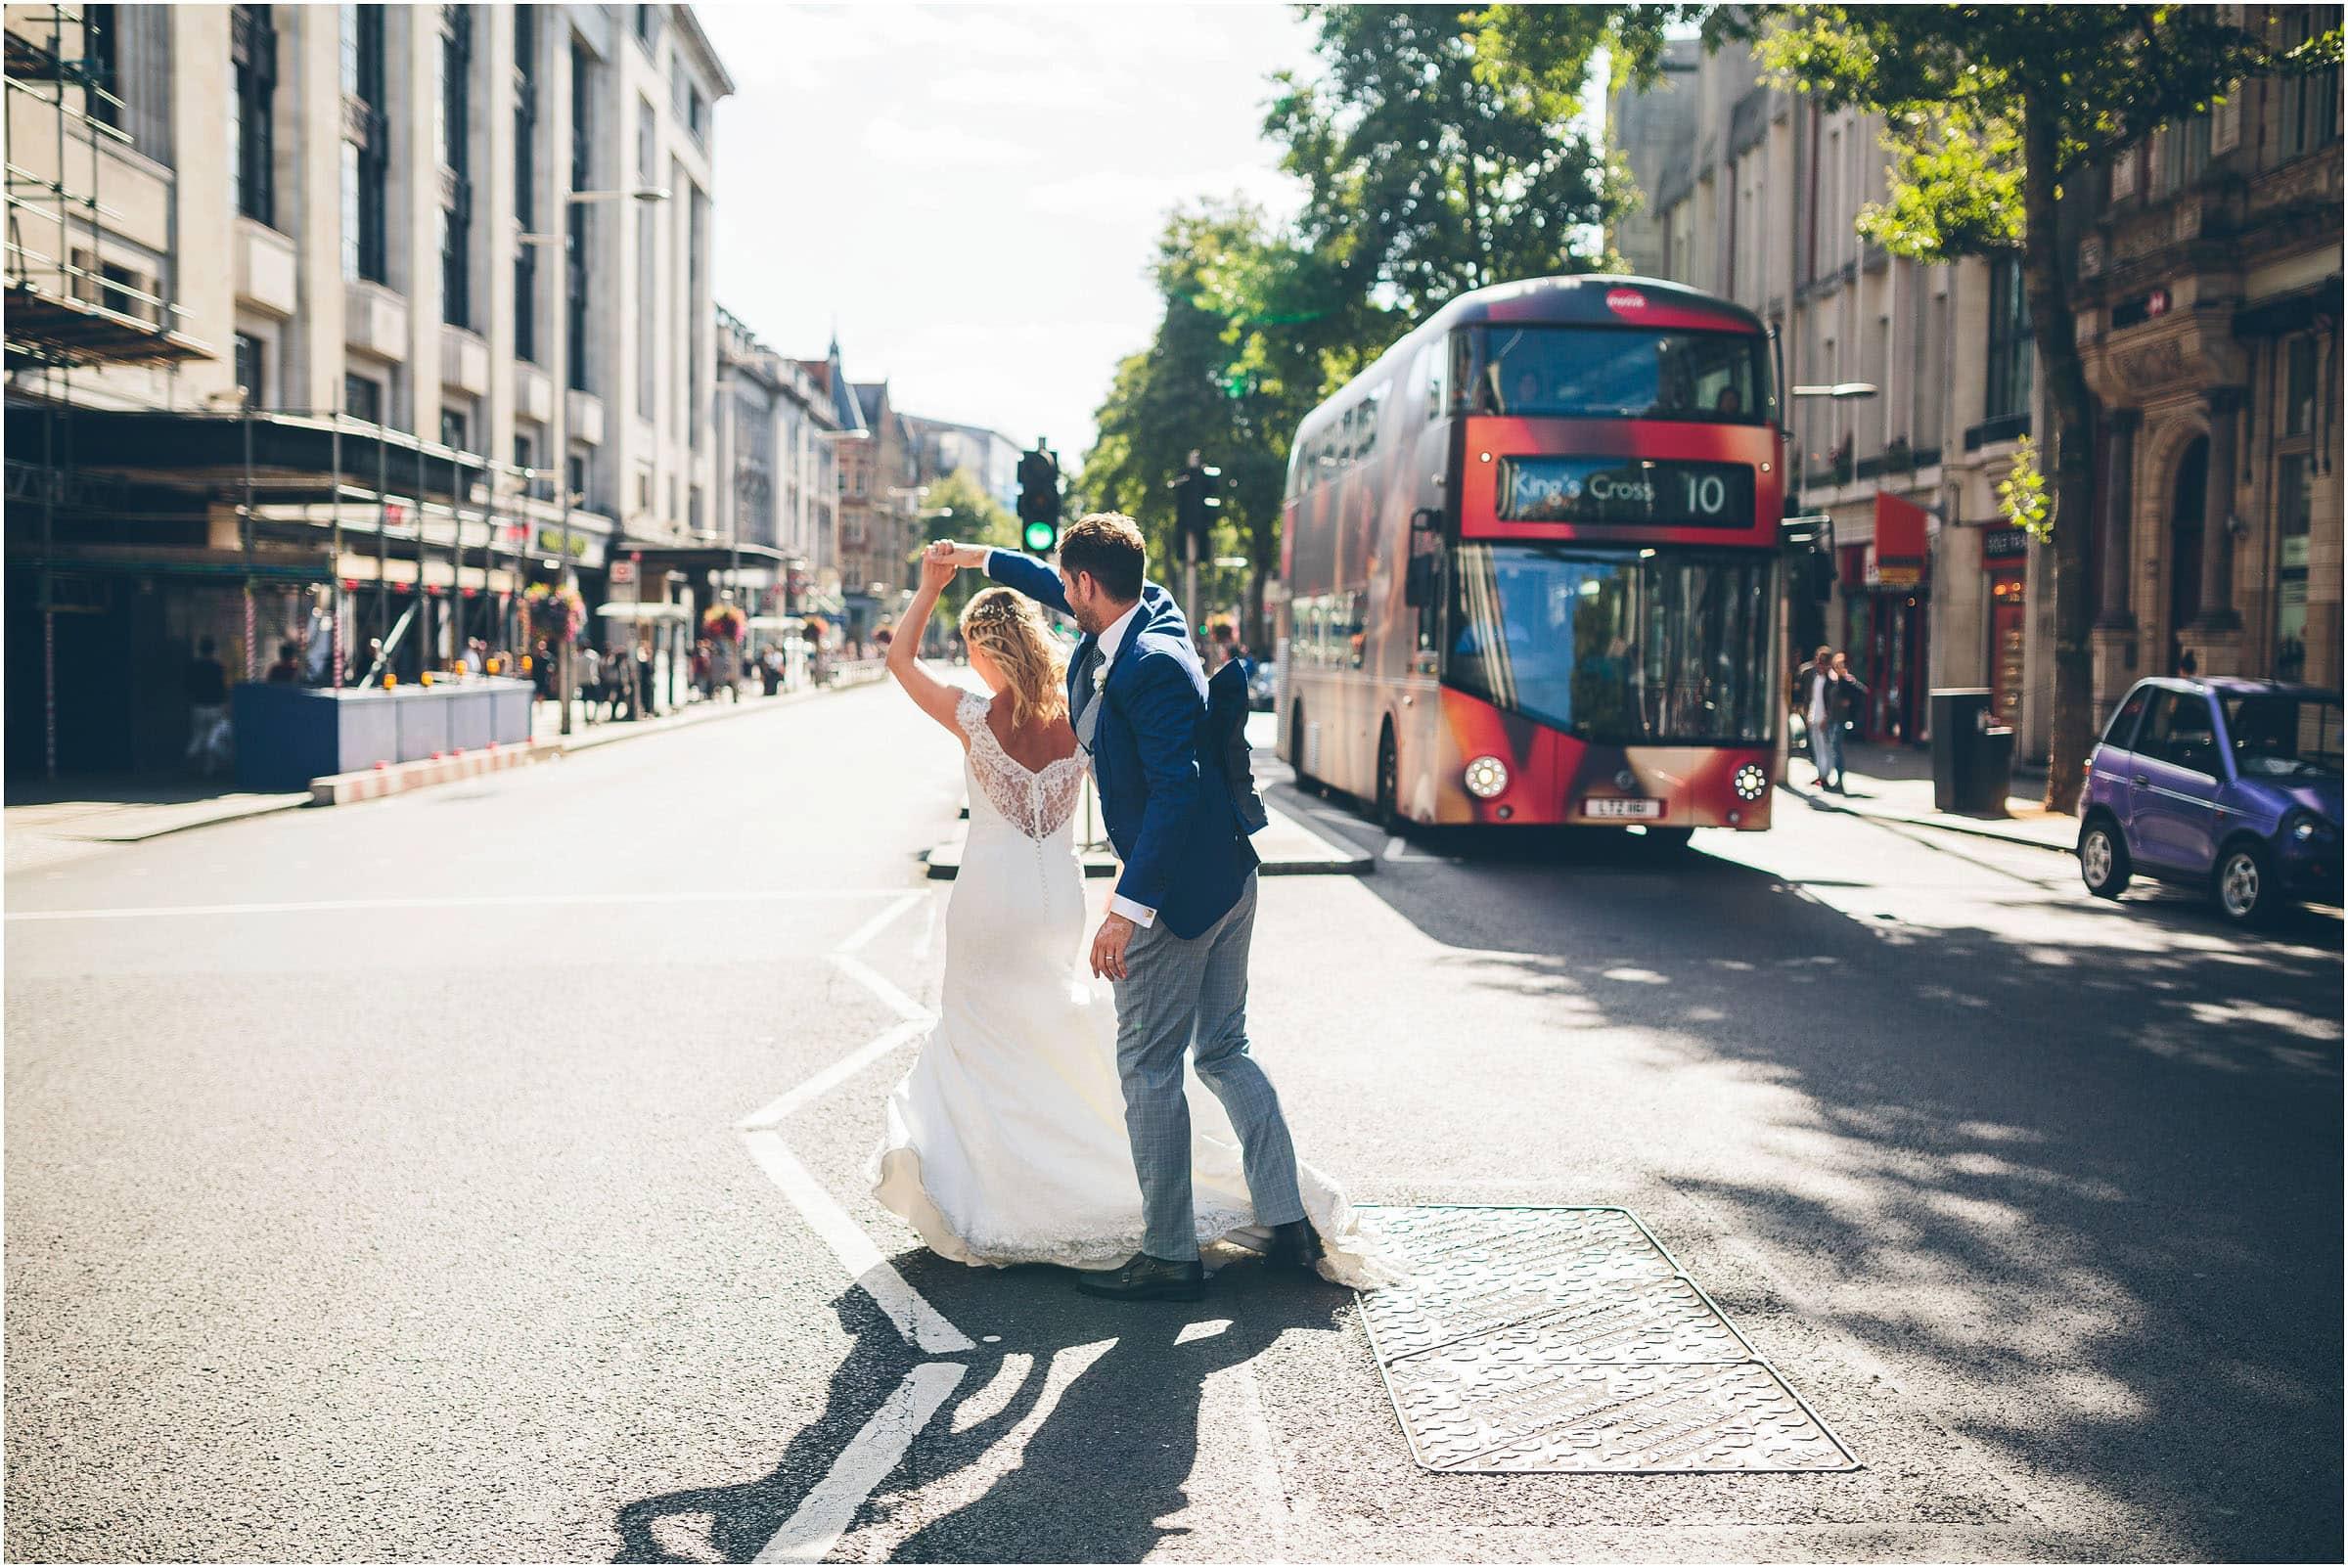 Kensington_Roof_Gardens_Wedding_Photography_0078